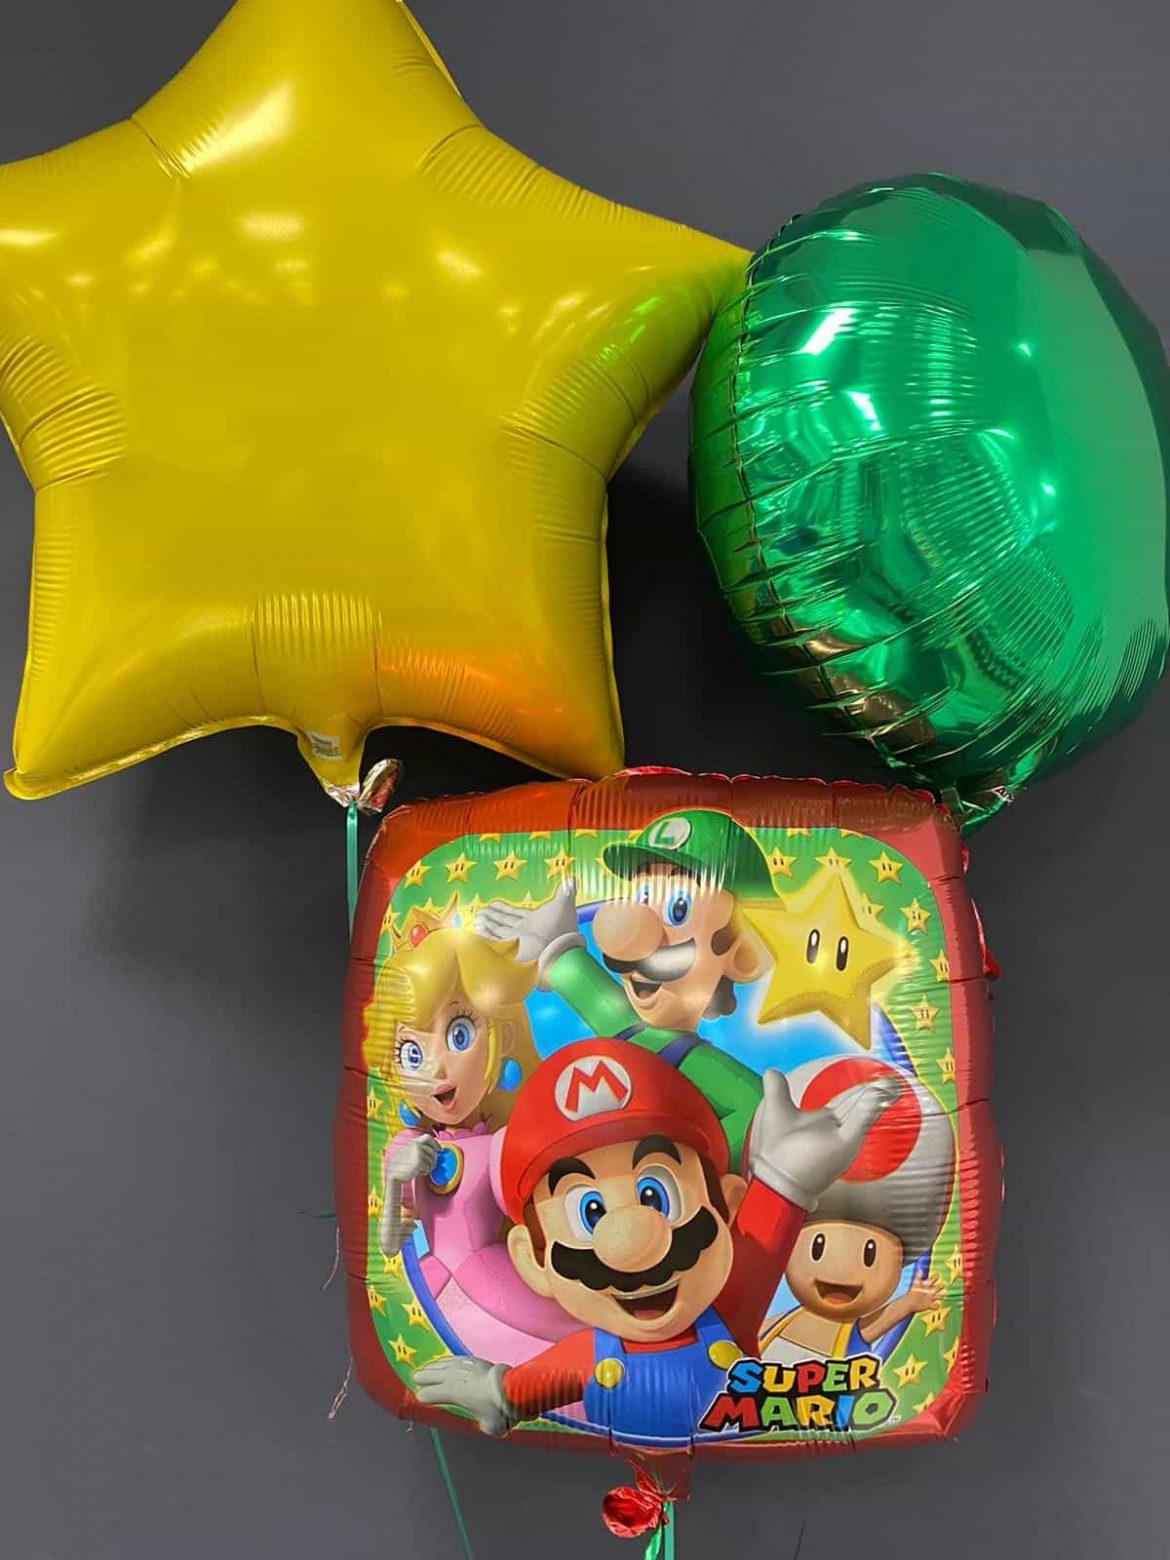 Super Mario € 5,50<br> Dekoballons je € 4,50 1